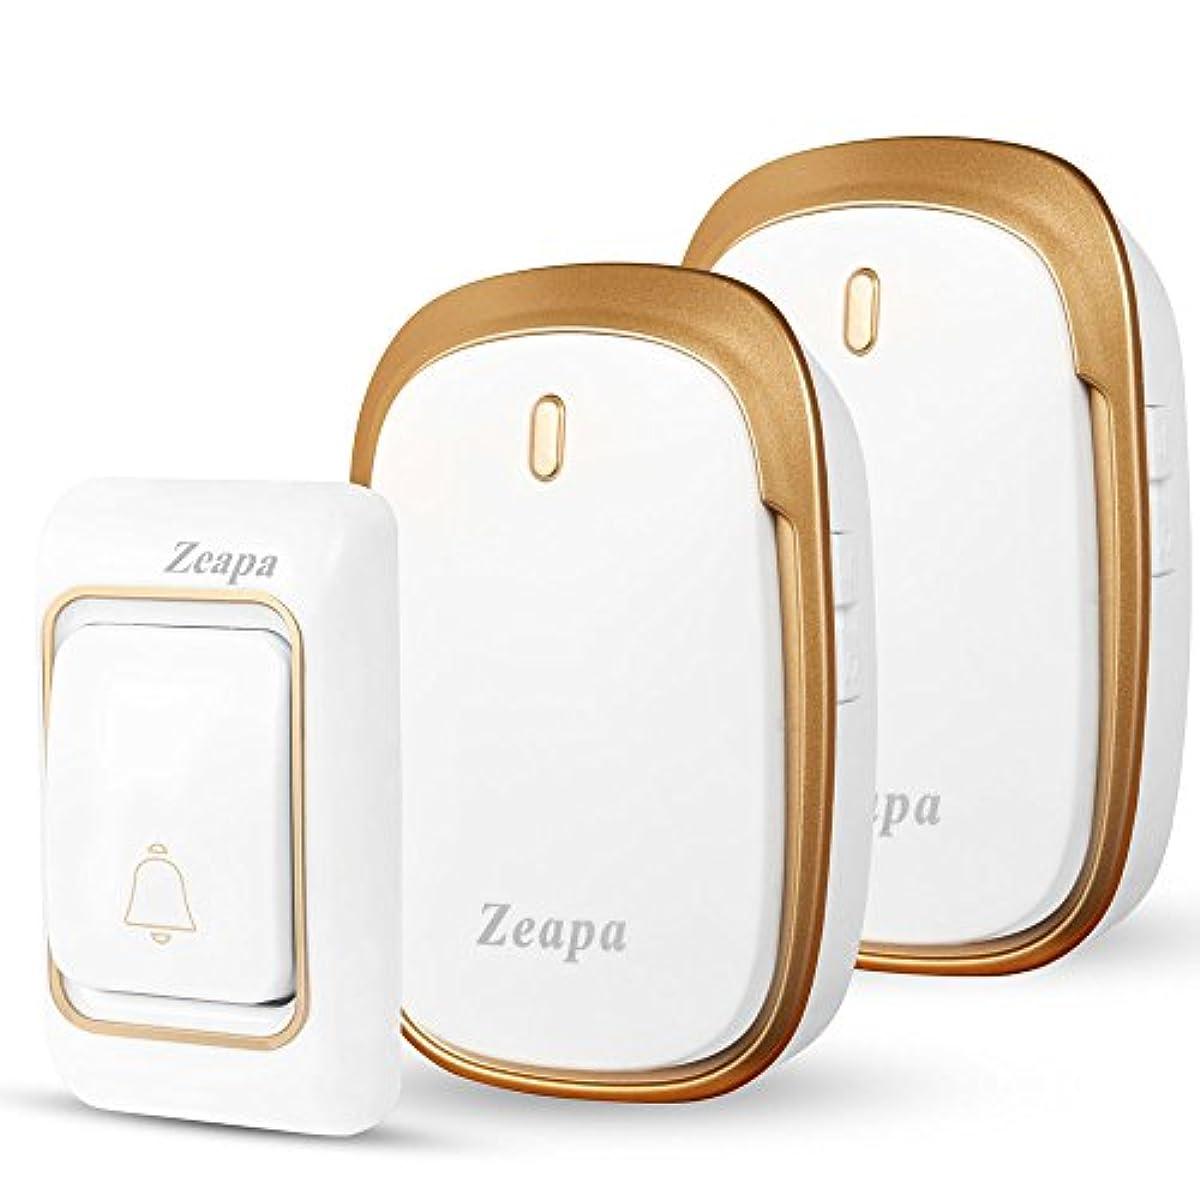 for Home Wireless Doorbell Long Distance Transmitter Receiver Doorbell Chime 1 to 1, U.S. regulations